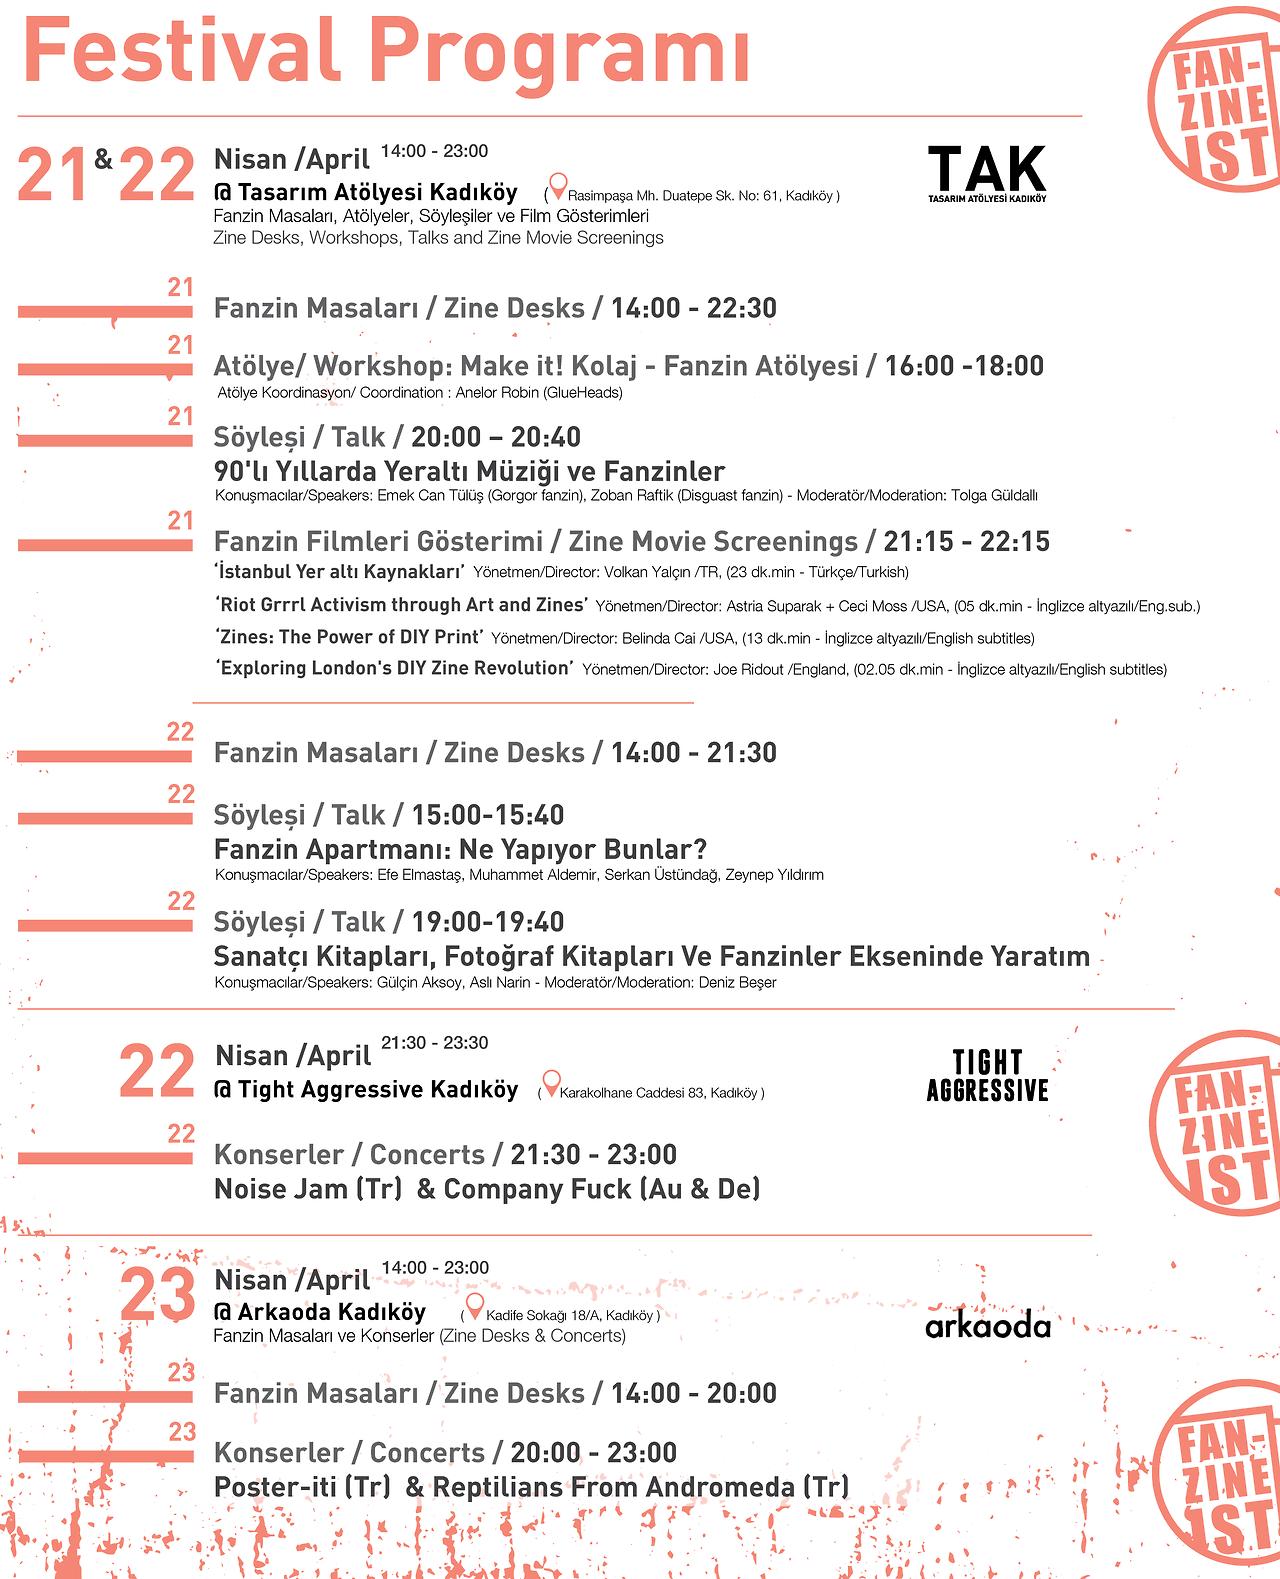 Company Fuck – Istanbul, Turkey – FanzineIst – 2017